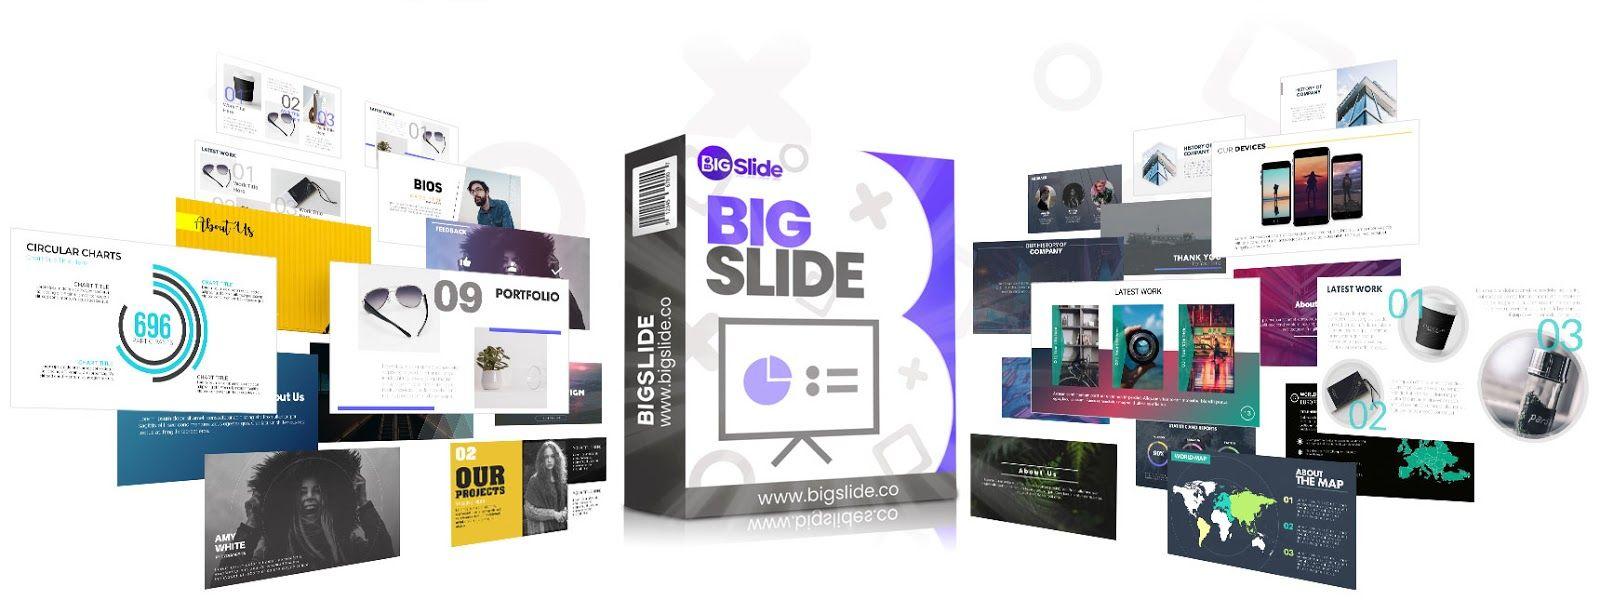 Big-Slide-Review-1